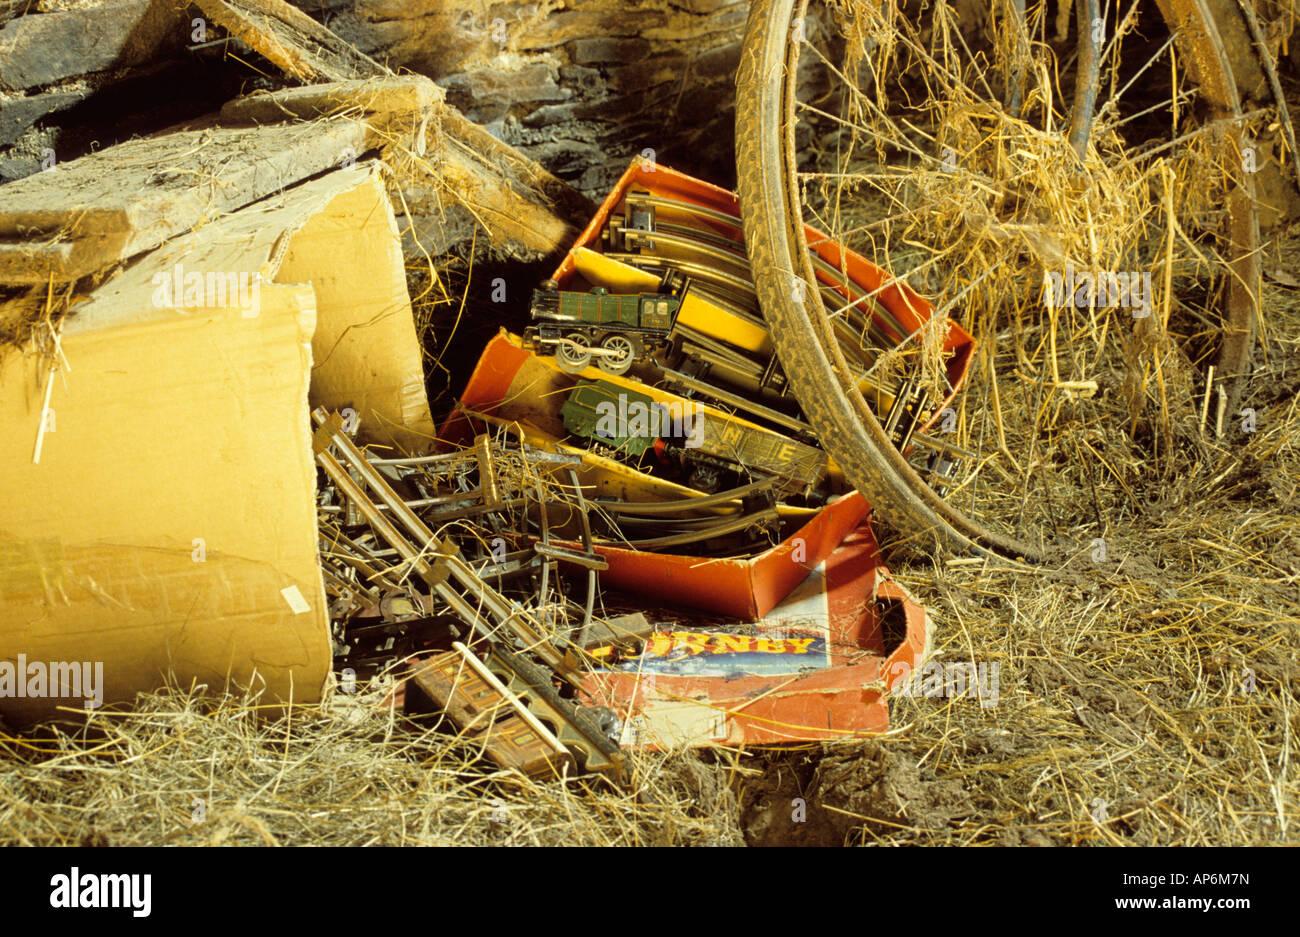 Old Hornby gauge 0 train set found in barn, UK. - Stock Image